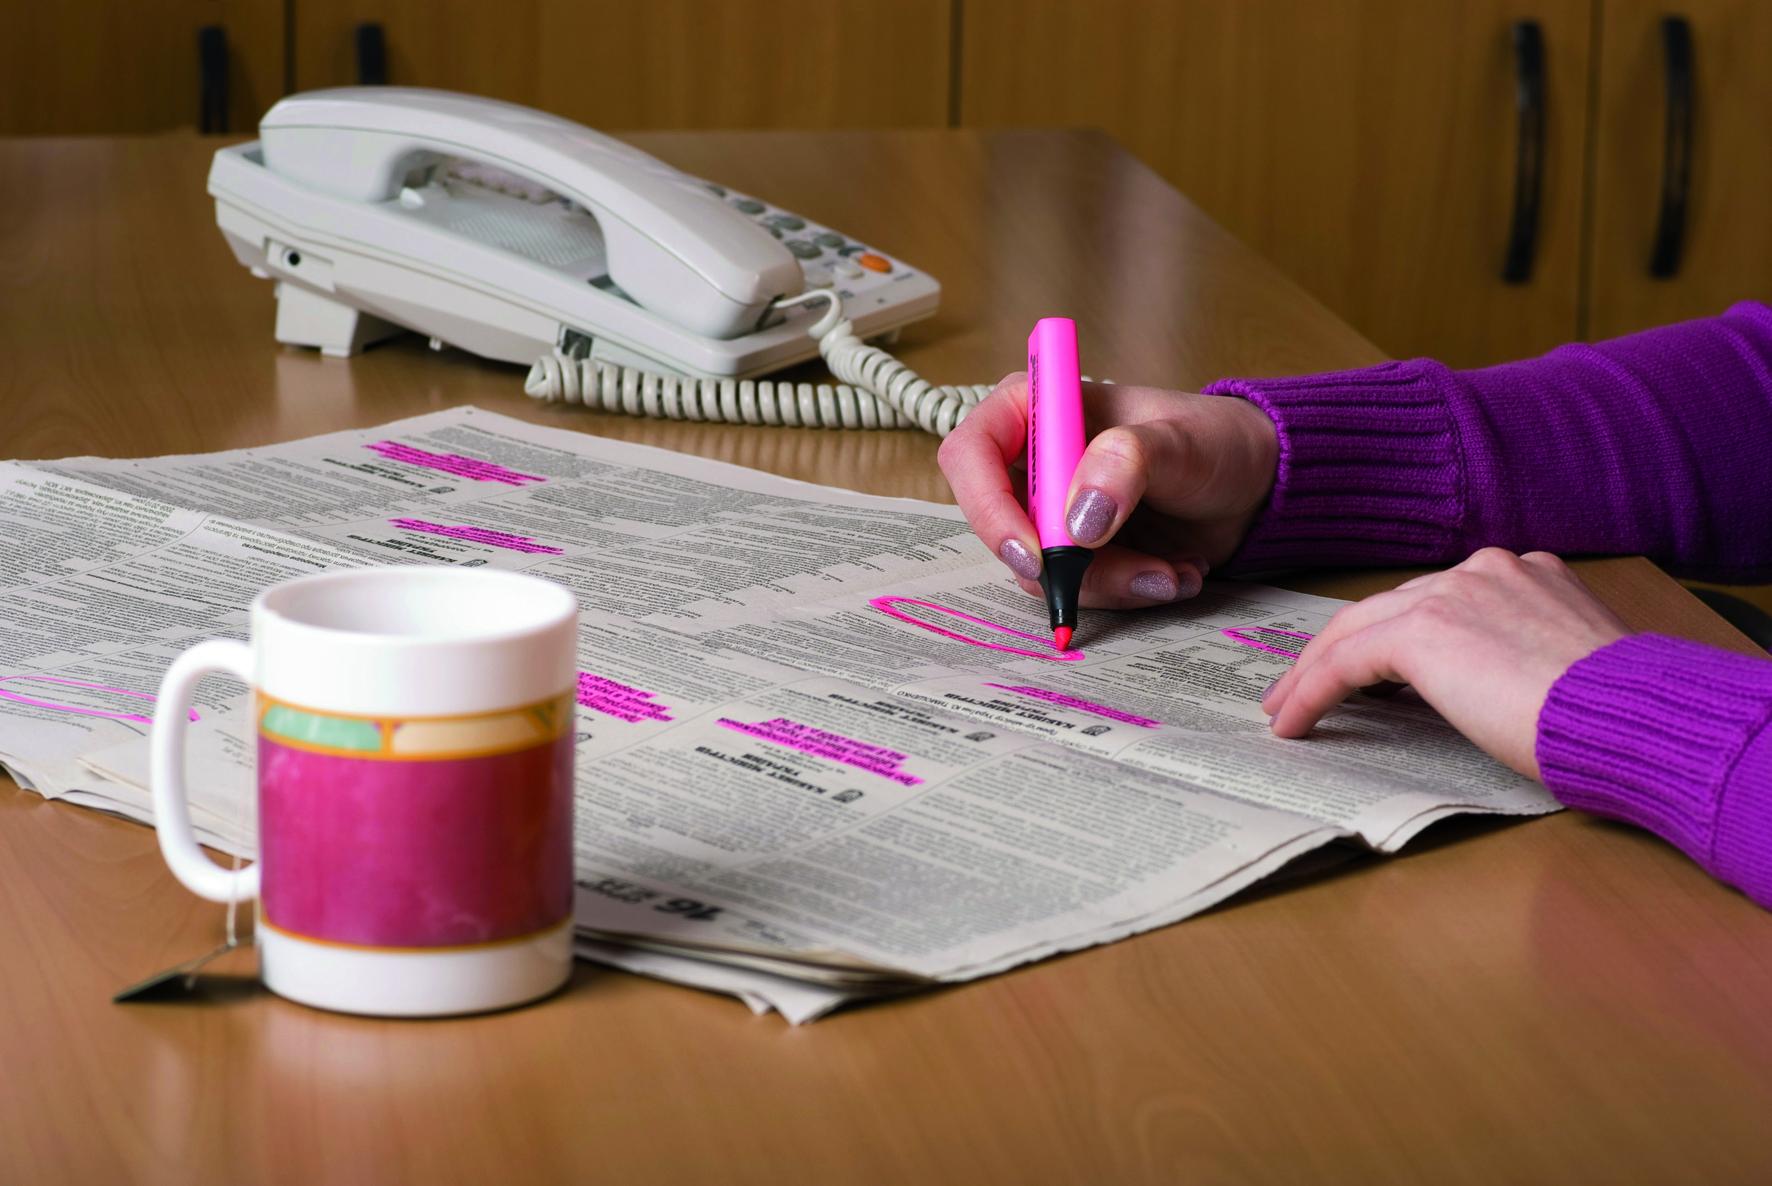 get that job universal jobmatch hints tips sweda get that job universal jobmatch hints tips